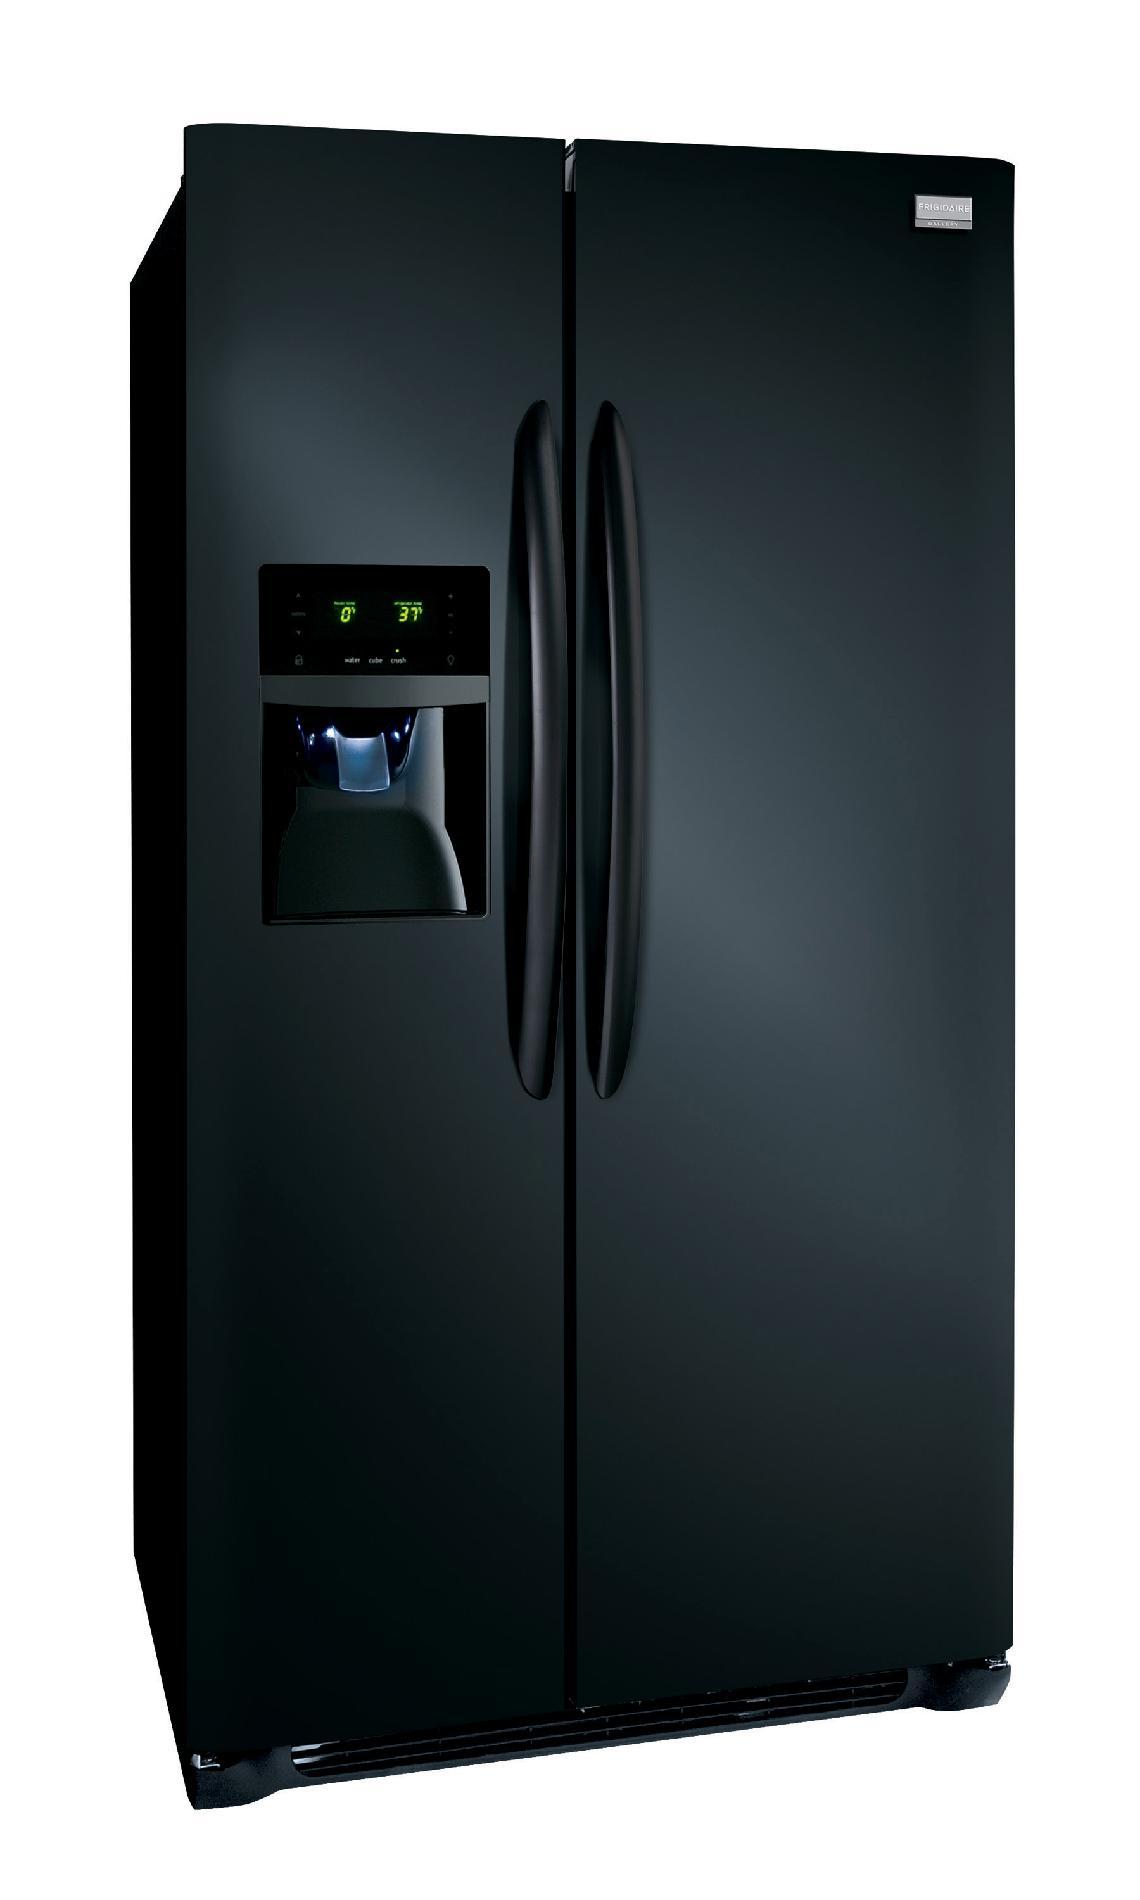 Frigidaire Gallery Gallery 26.0 cu. ft. Side-by-Side Refrigerator - Black